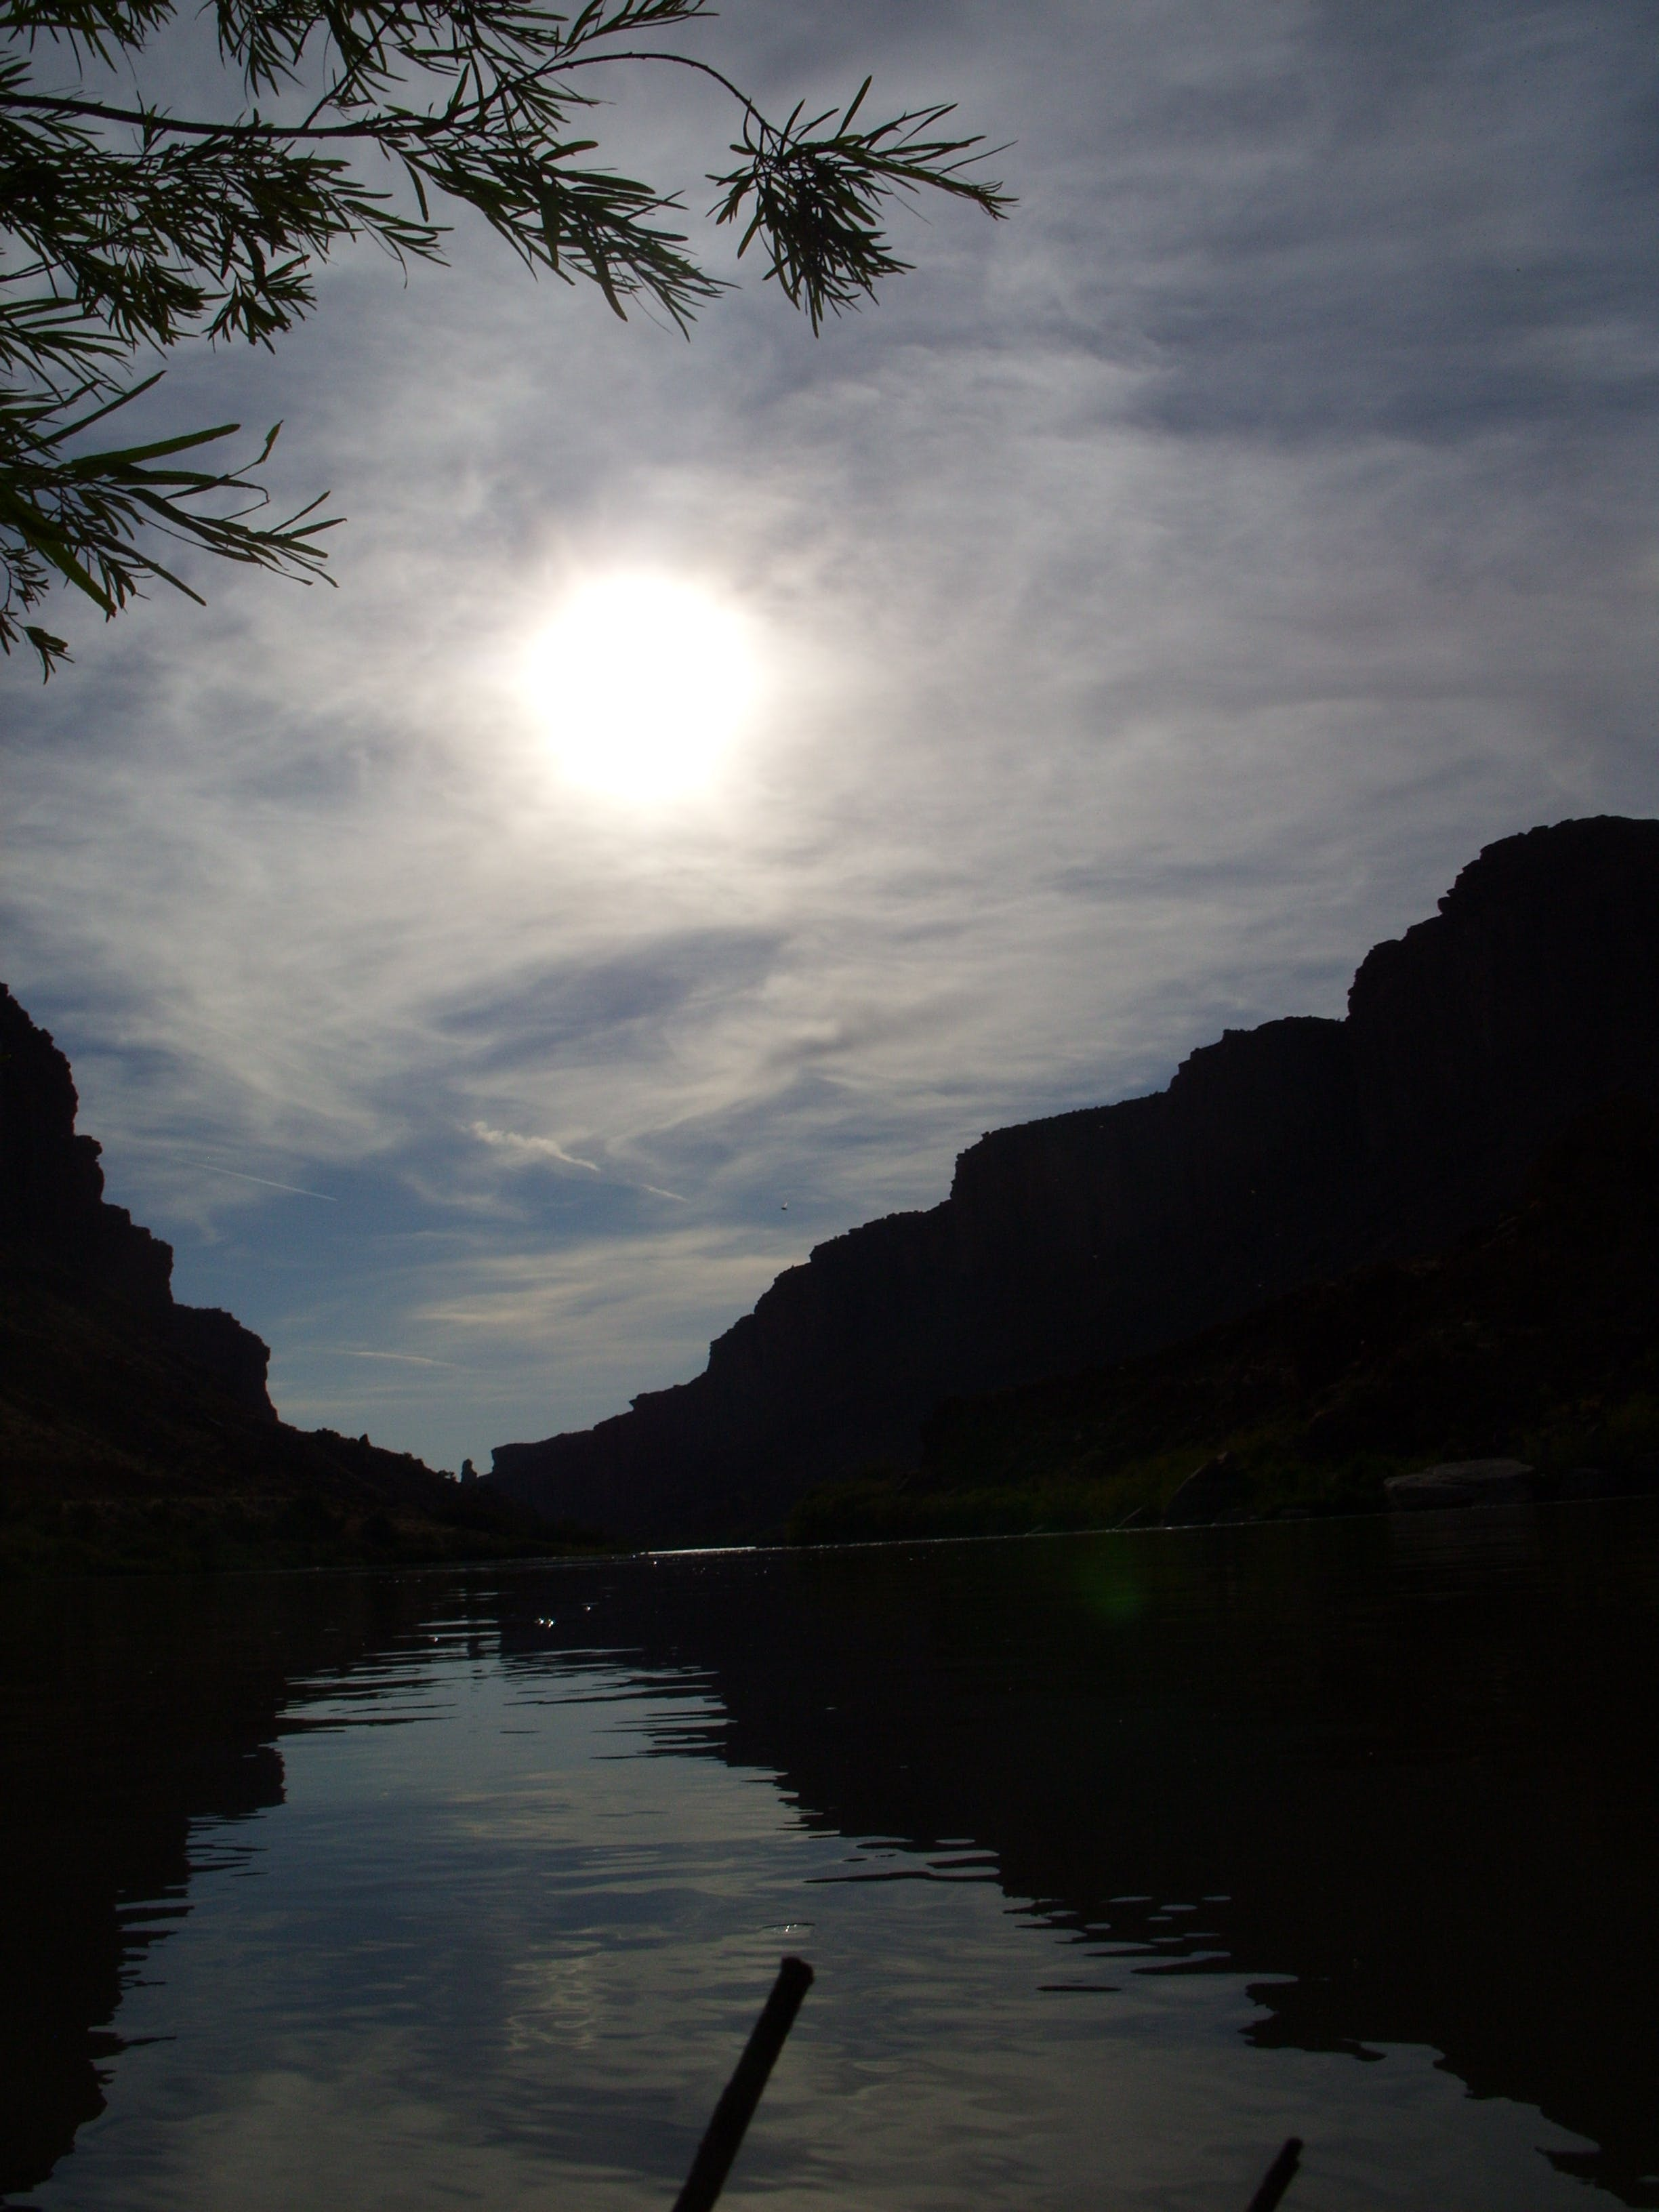 Free stock photo of Joe Leineweber, moab, river